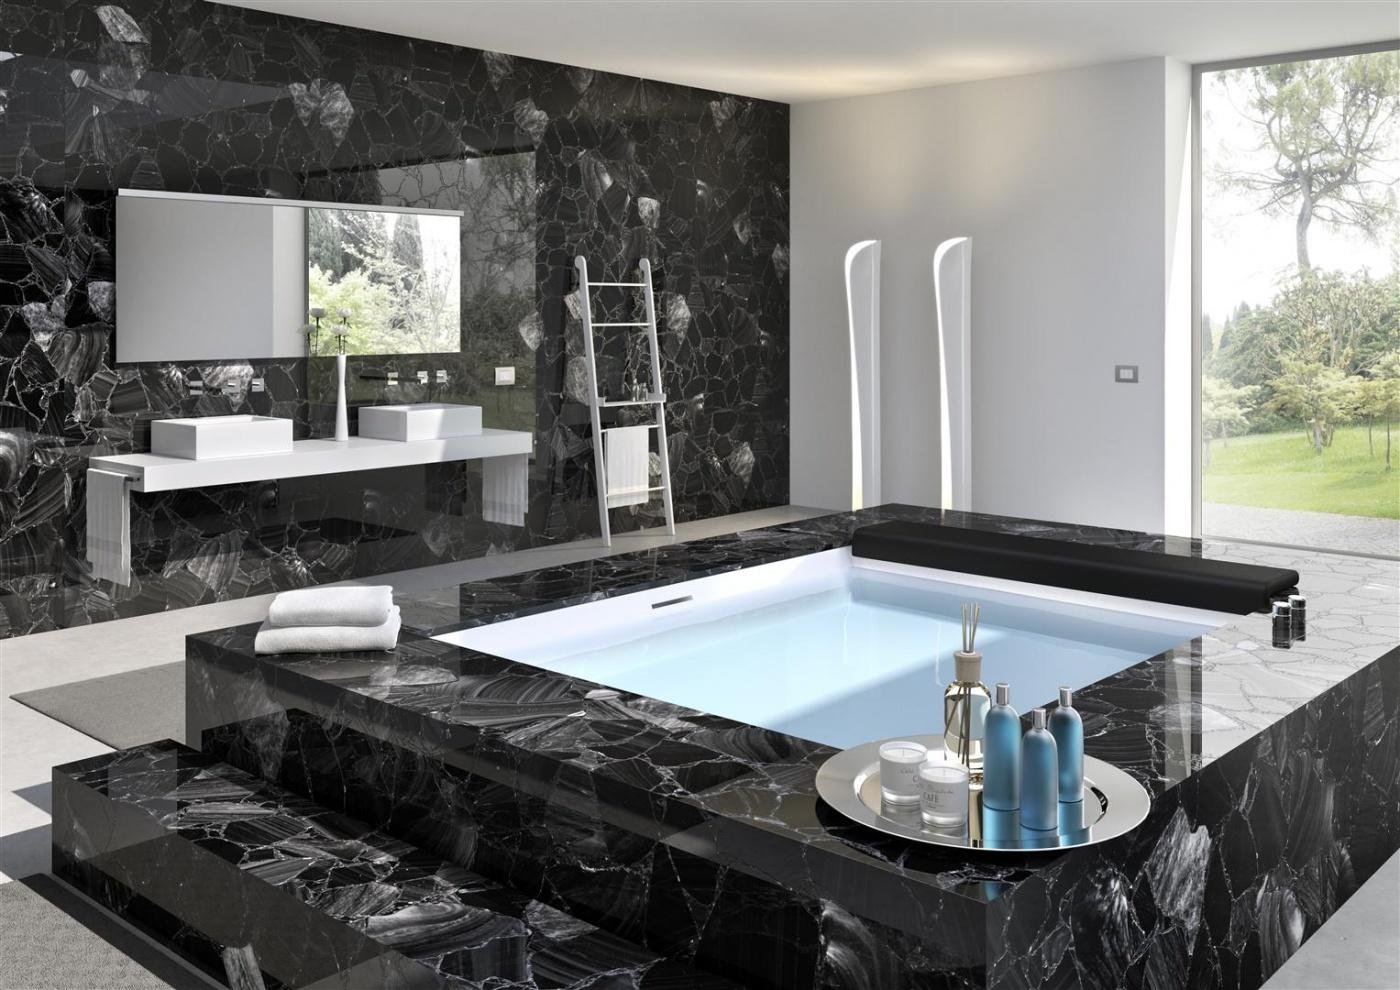 Pierre calcaire Black Obsidian bath